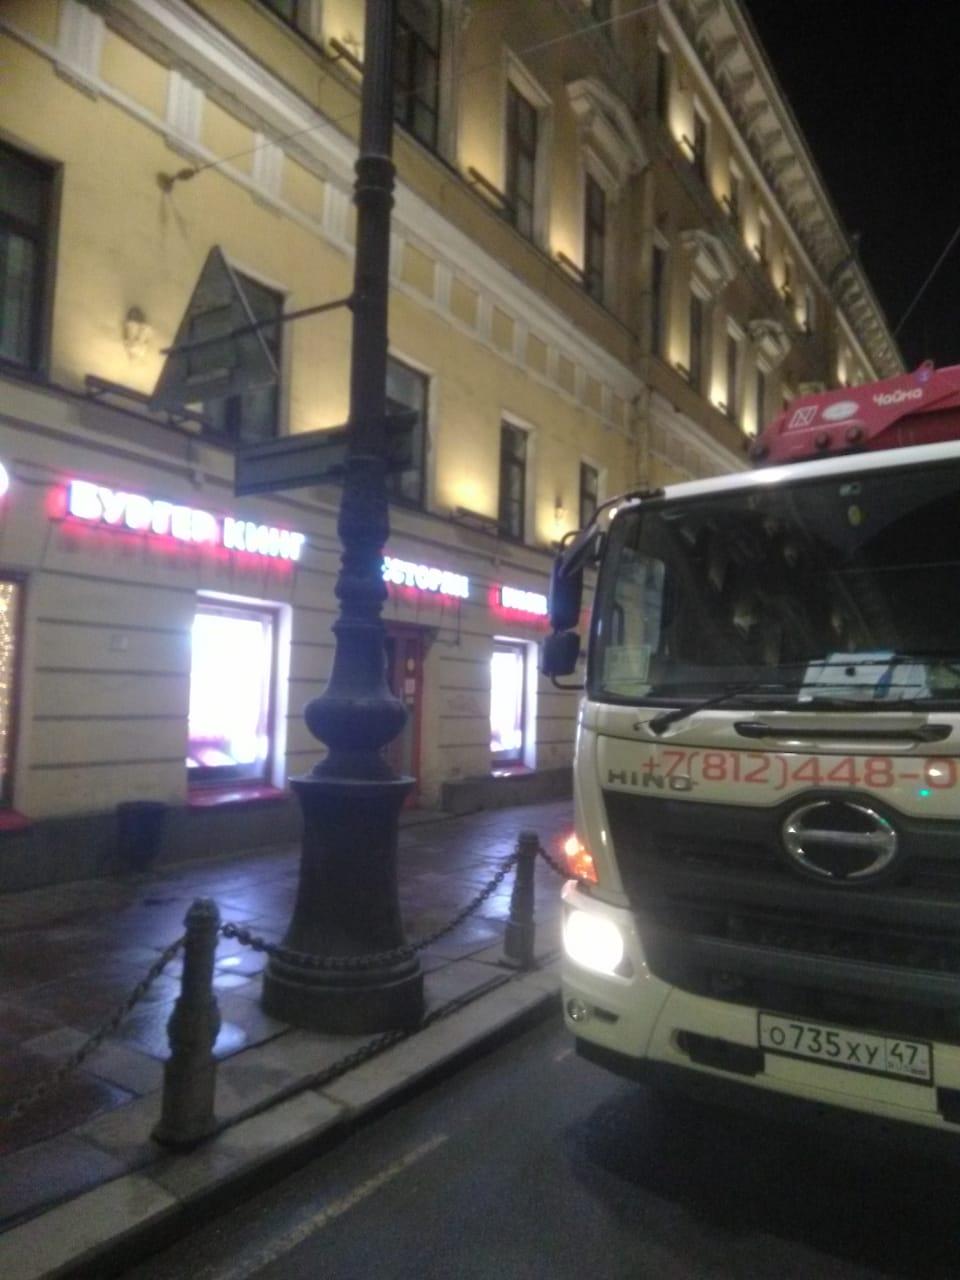 Услуги по аренде спецтехники в Ленинградской области